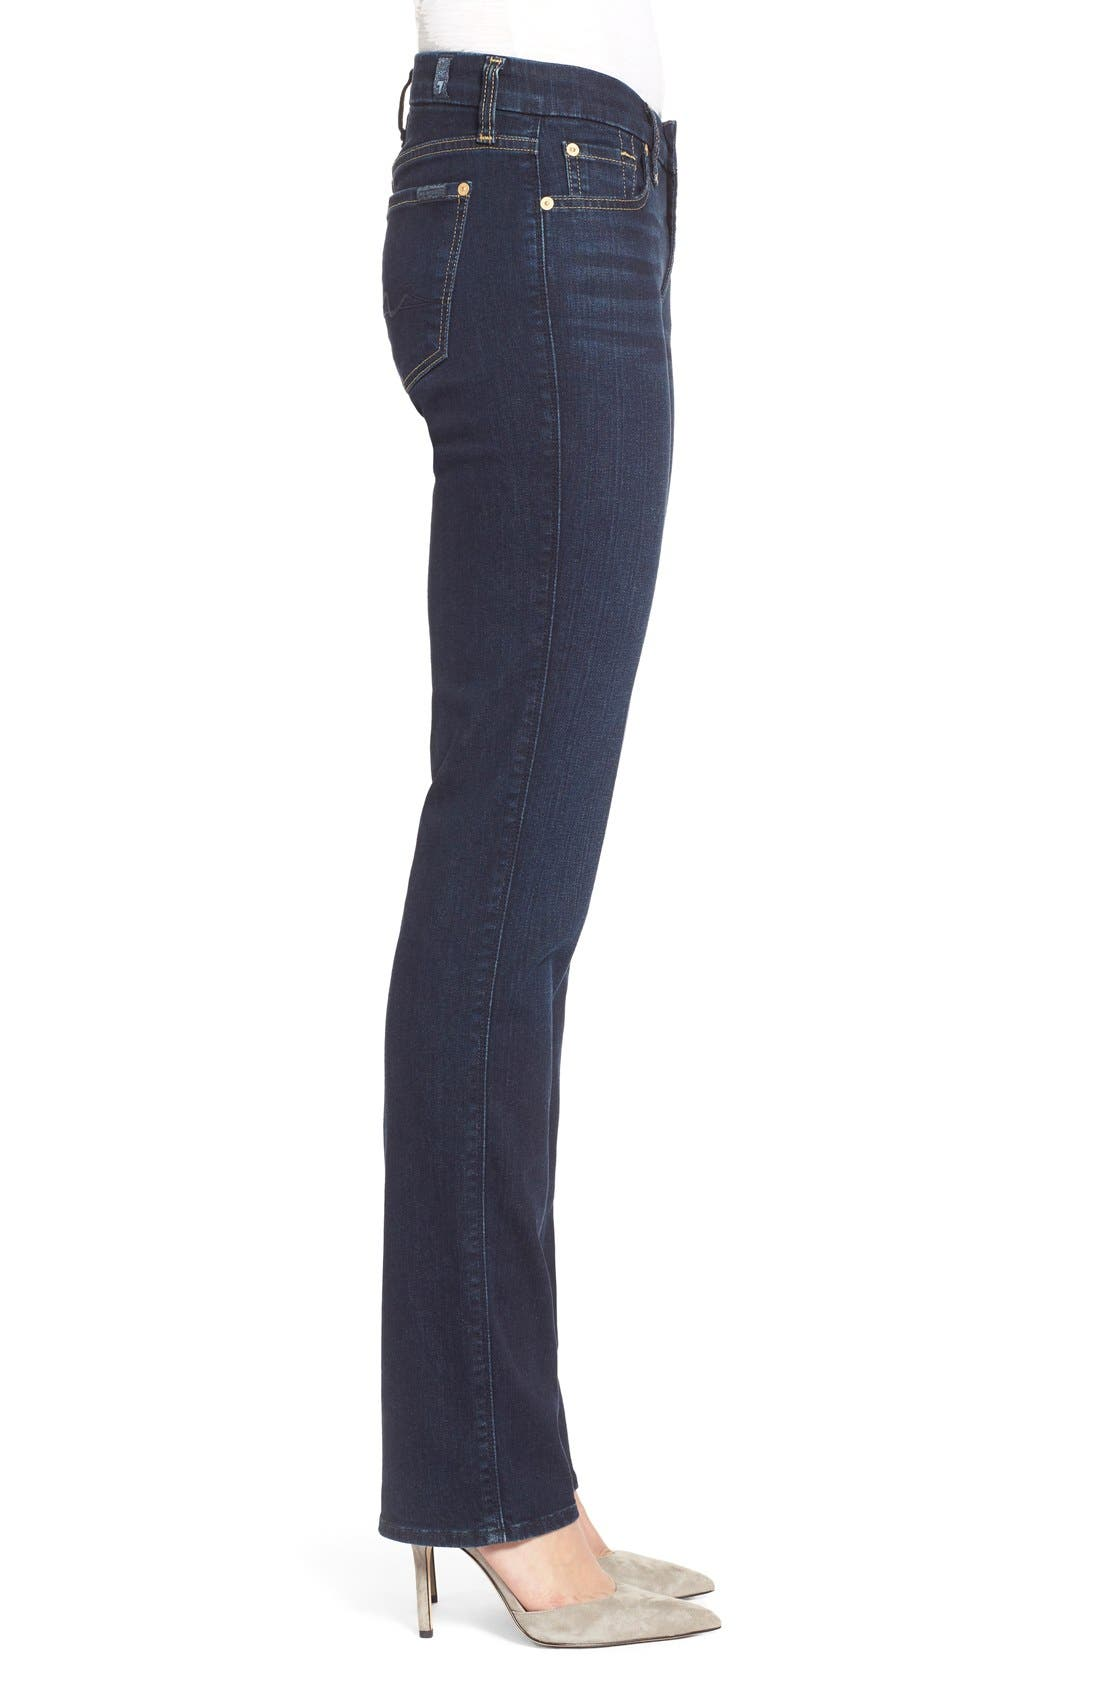 Alternate Image 3  - 7 For All Mankind® 'Kimmie' Straight Leg Jeans (Dark Dusk Indigo)